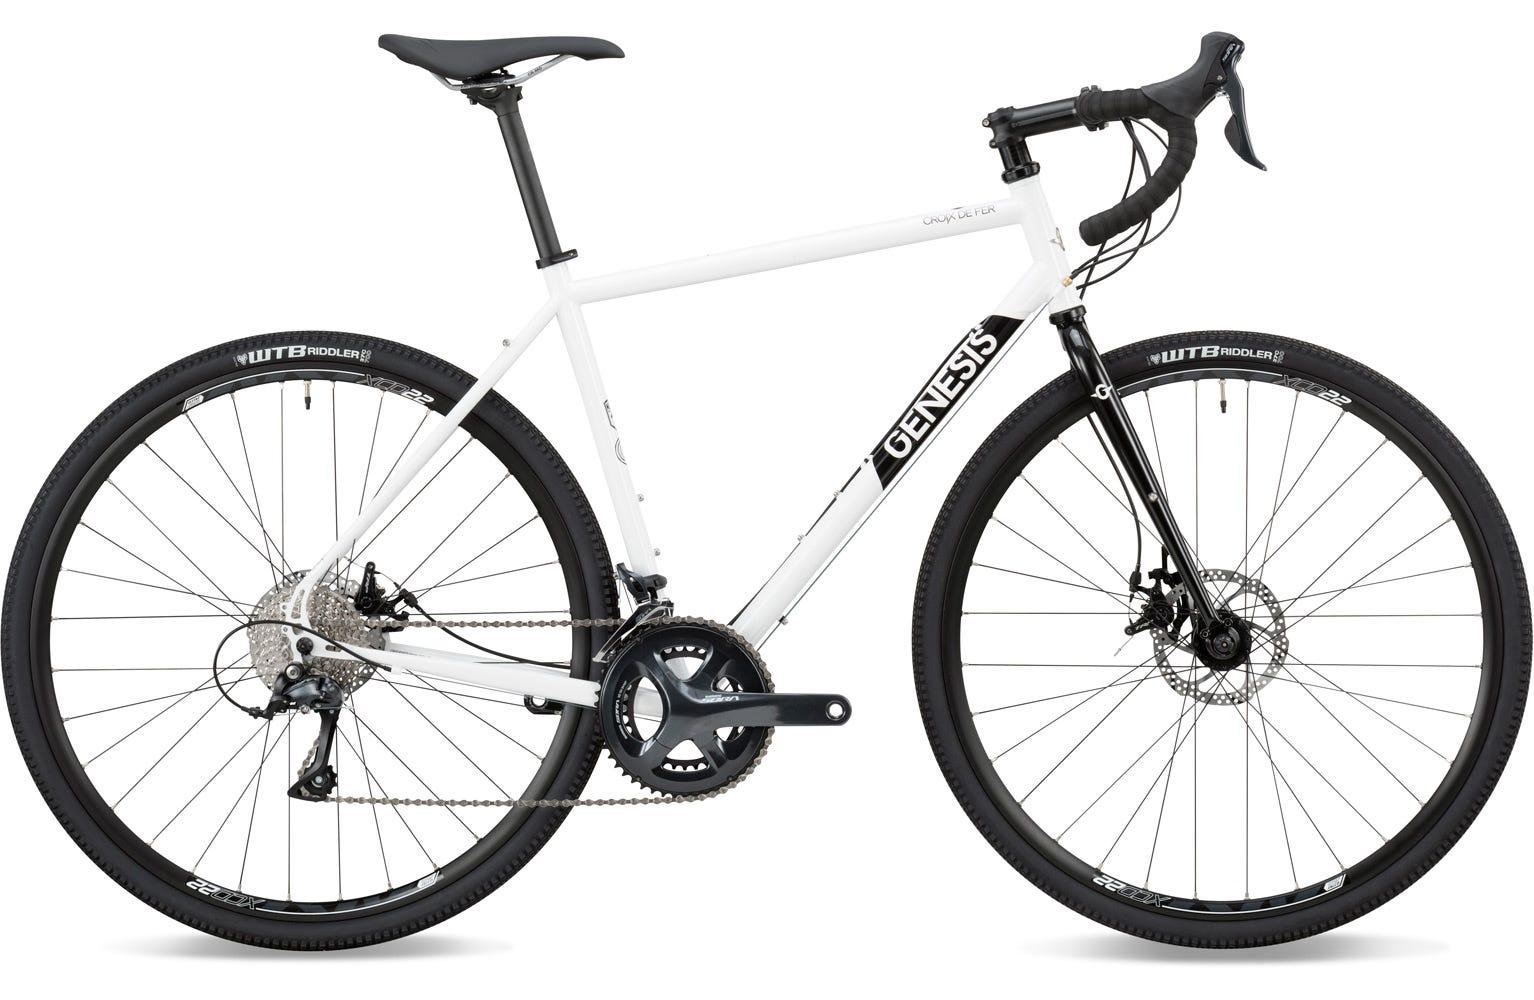 Genesis 2020 Croix De Fer 10